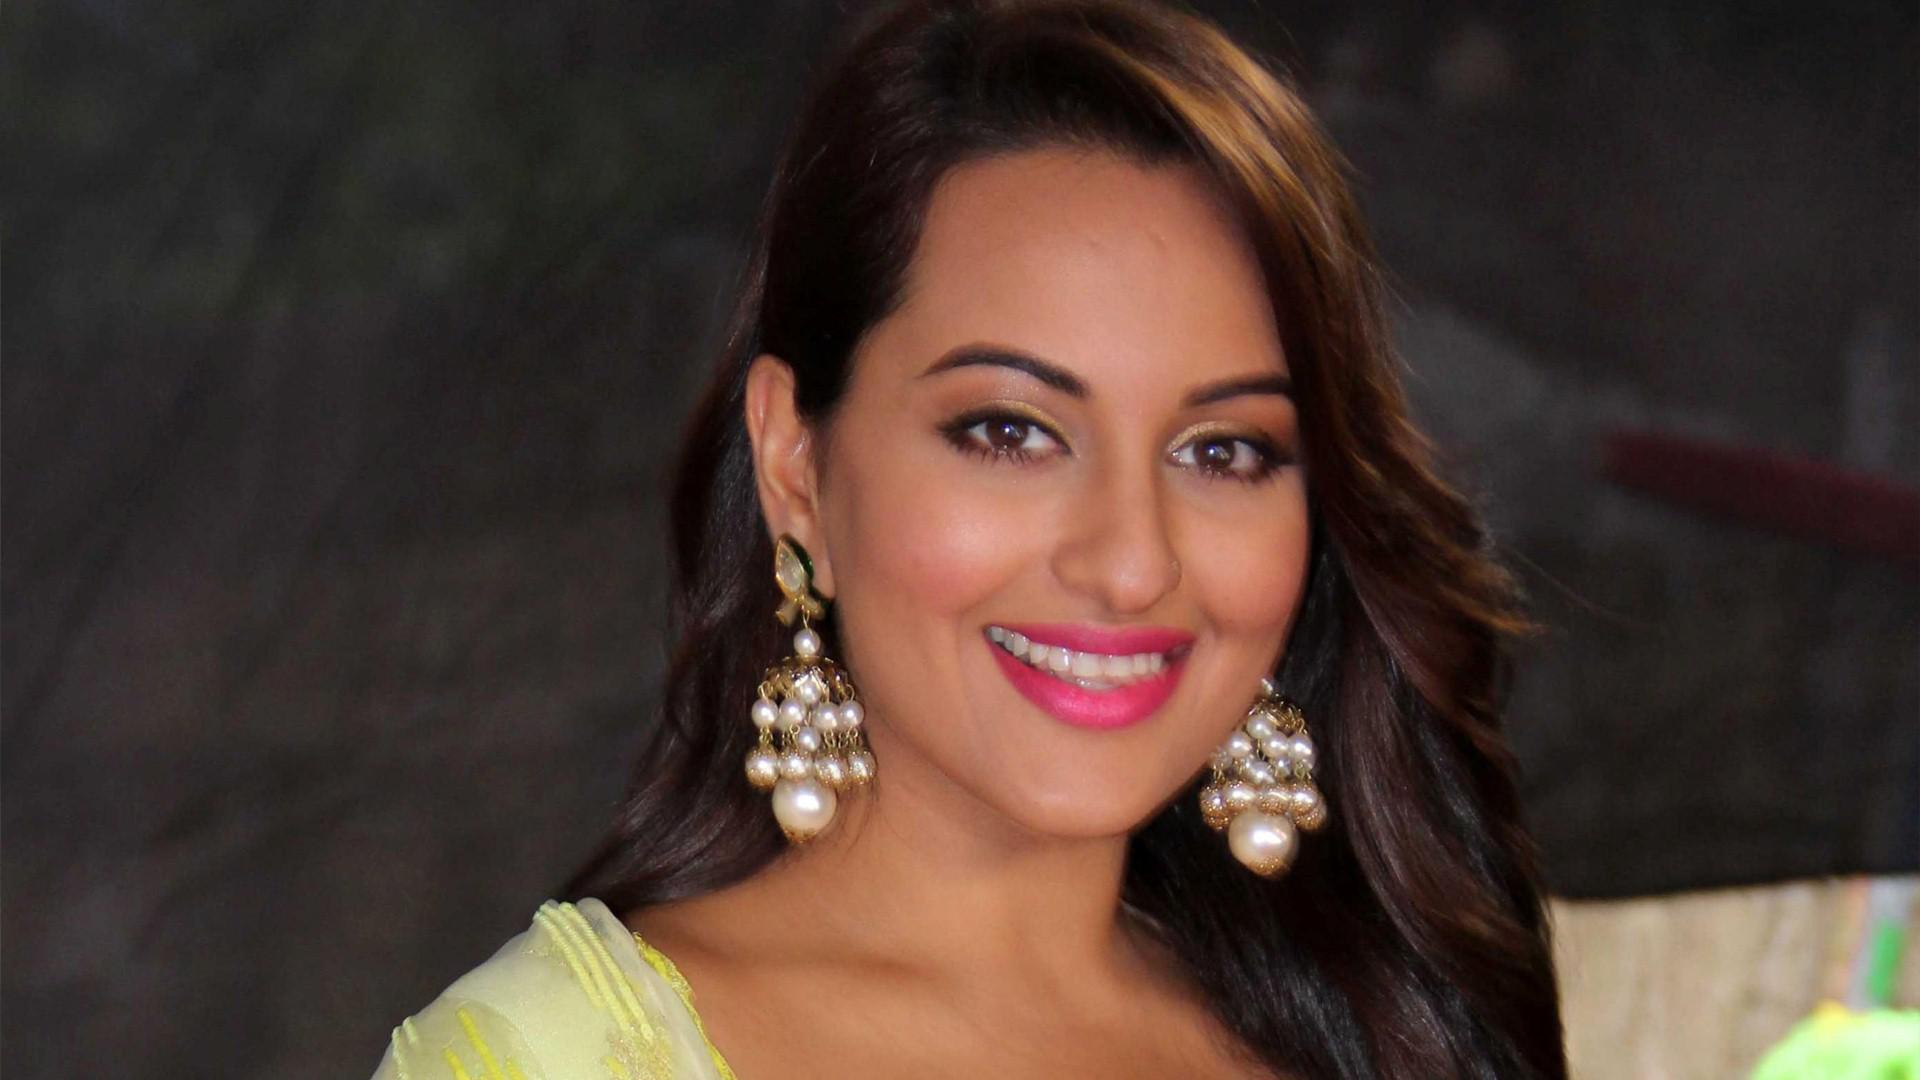 Bollywood Heroine Images Download For Mobile Wallpaper